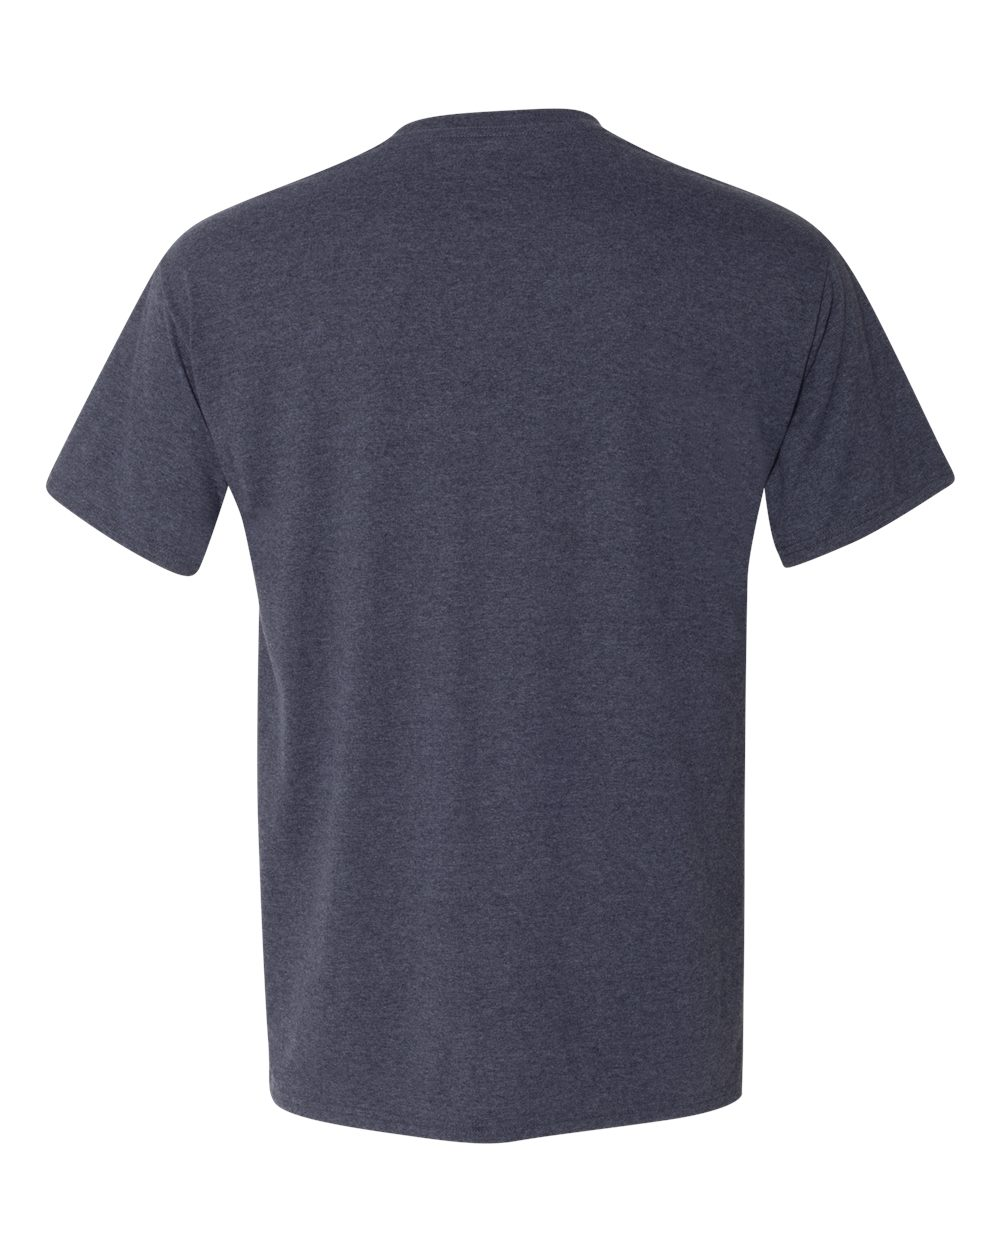 Hanes-Men-039-s-X-Temp-Triblend-T-Shirt-With-Fresh-Iq-42TB-S-3XL thumbnail 21